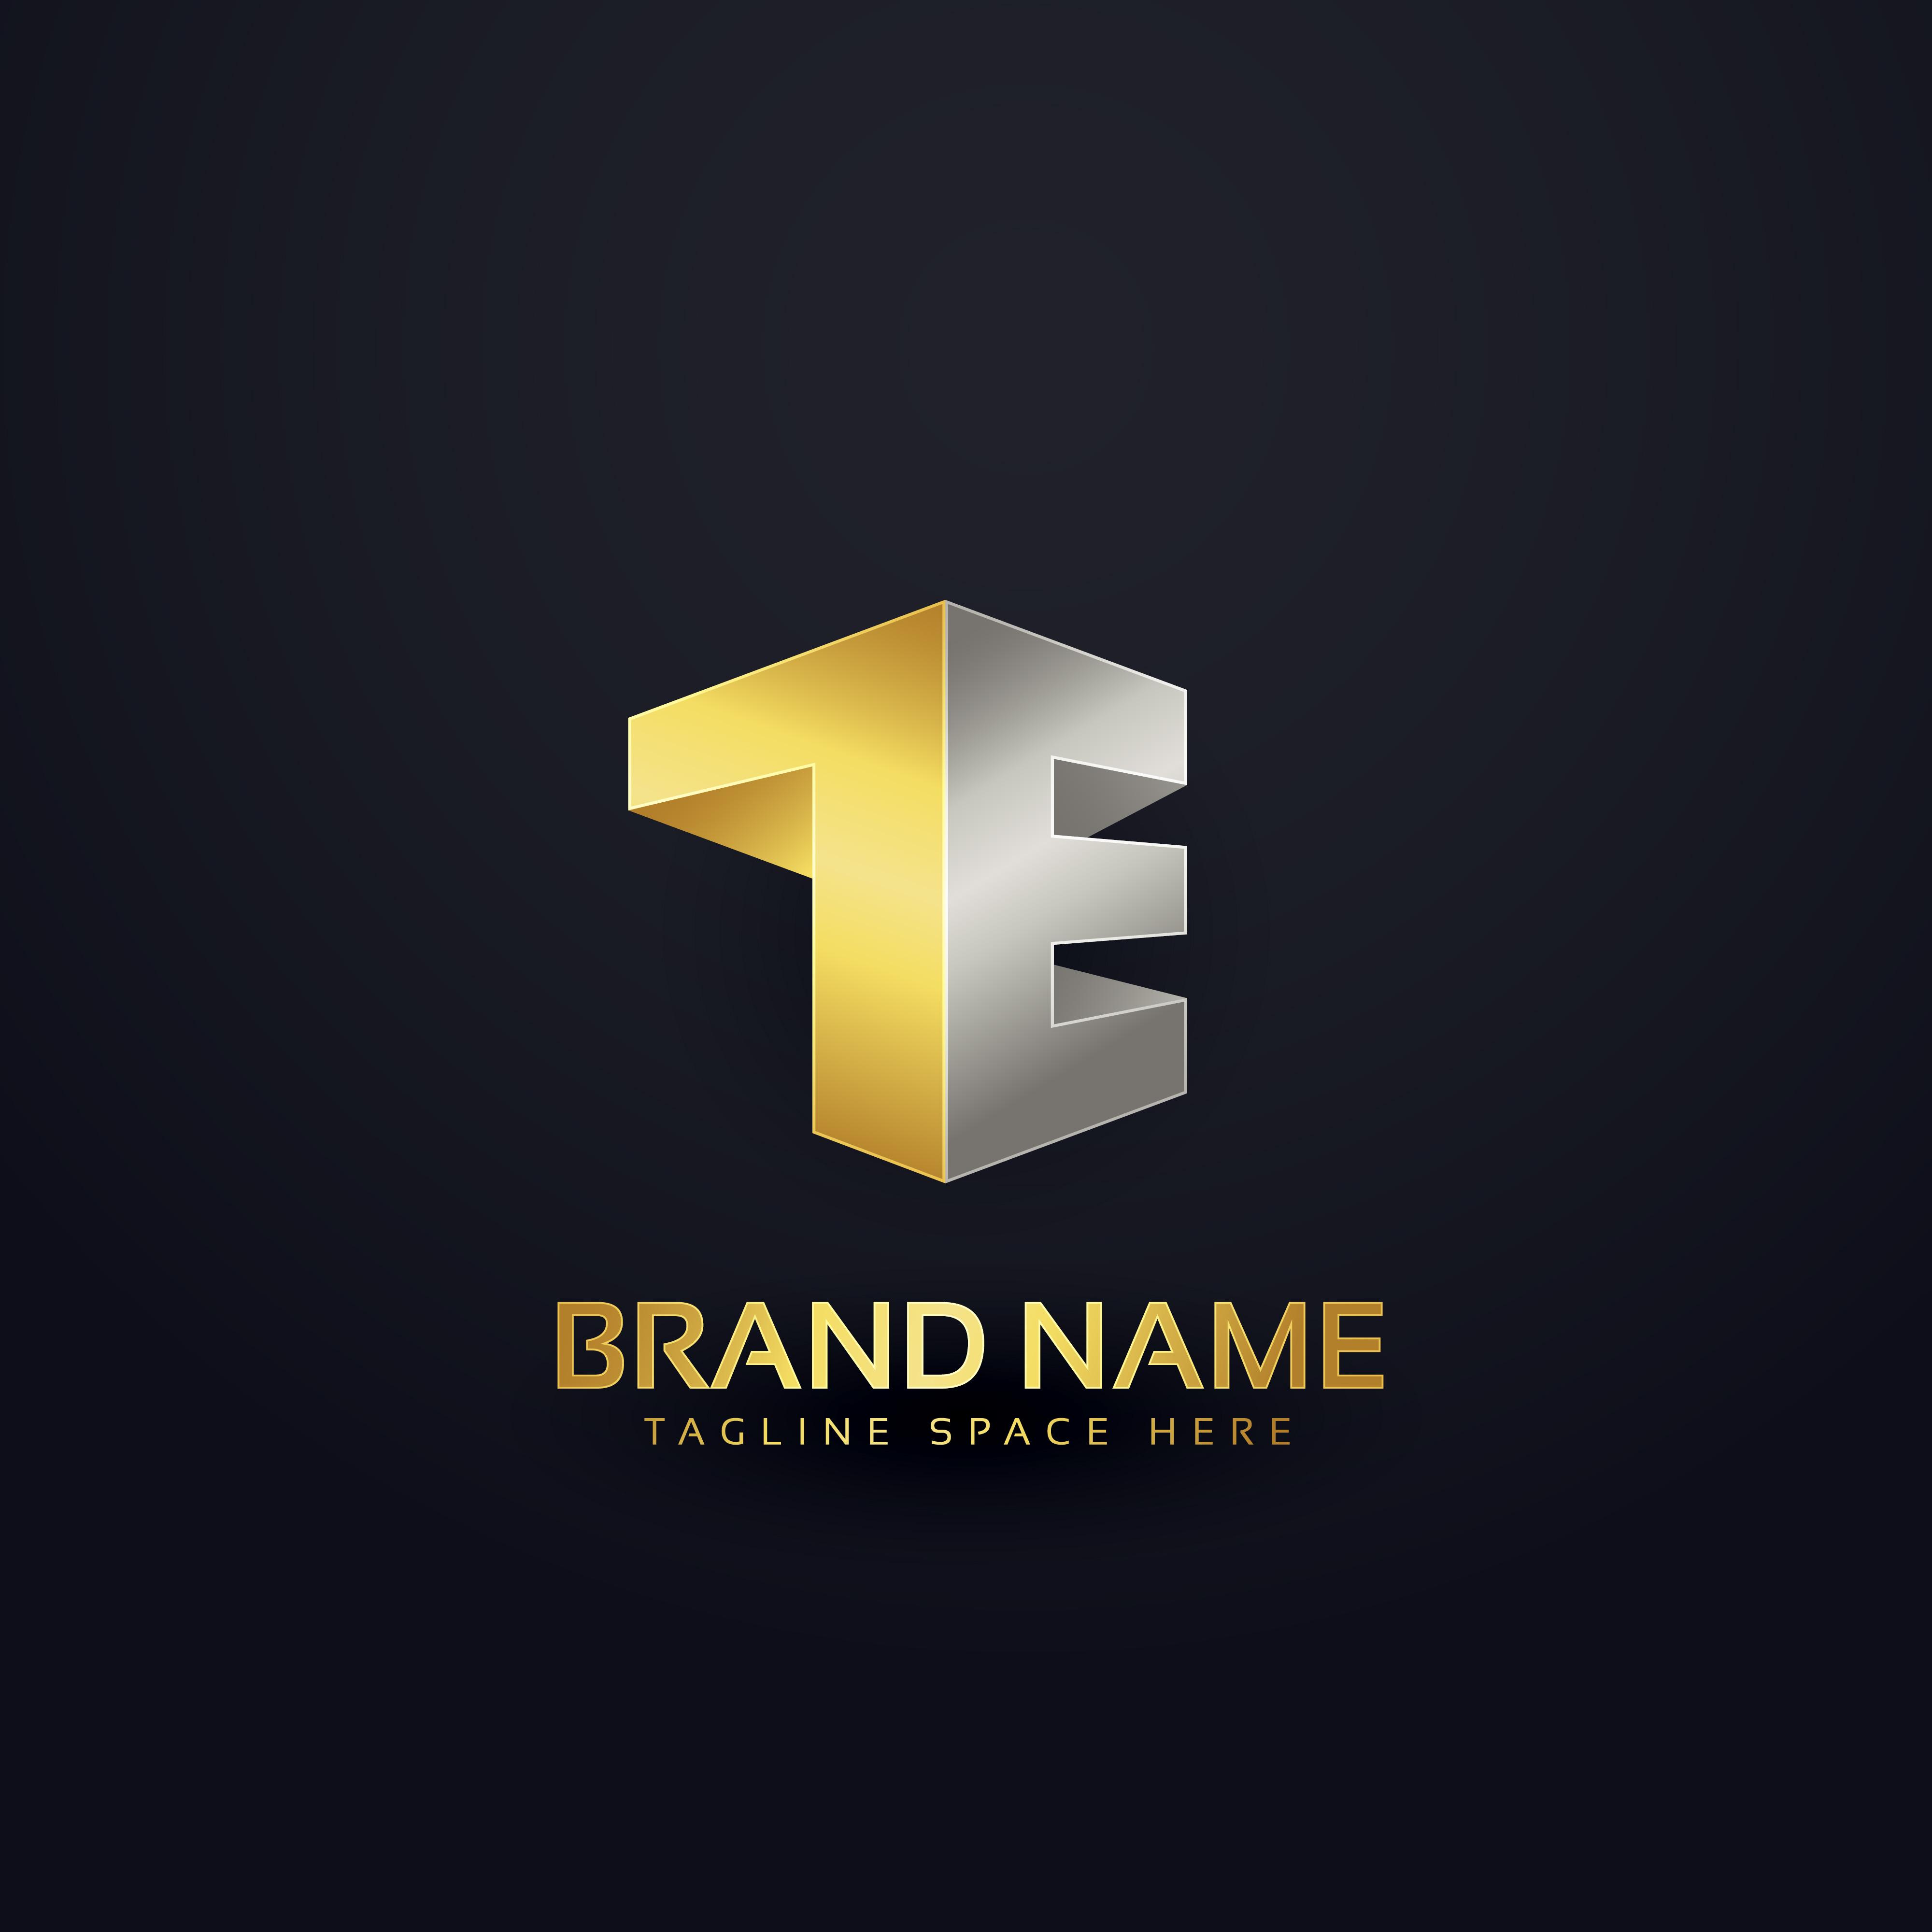 logo concept design in golden premium style for letter t